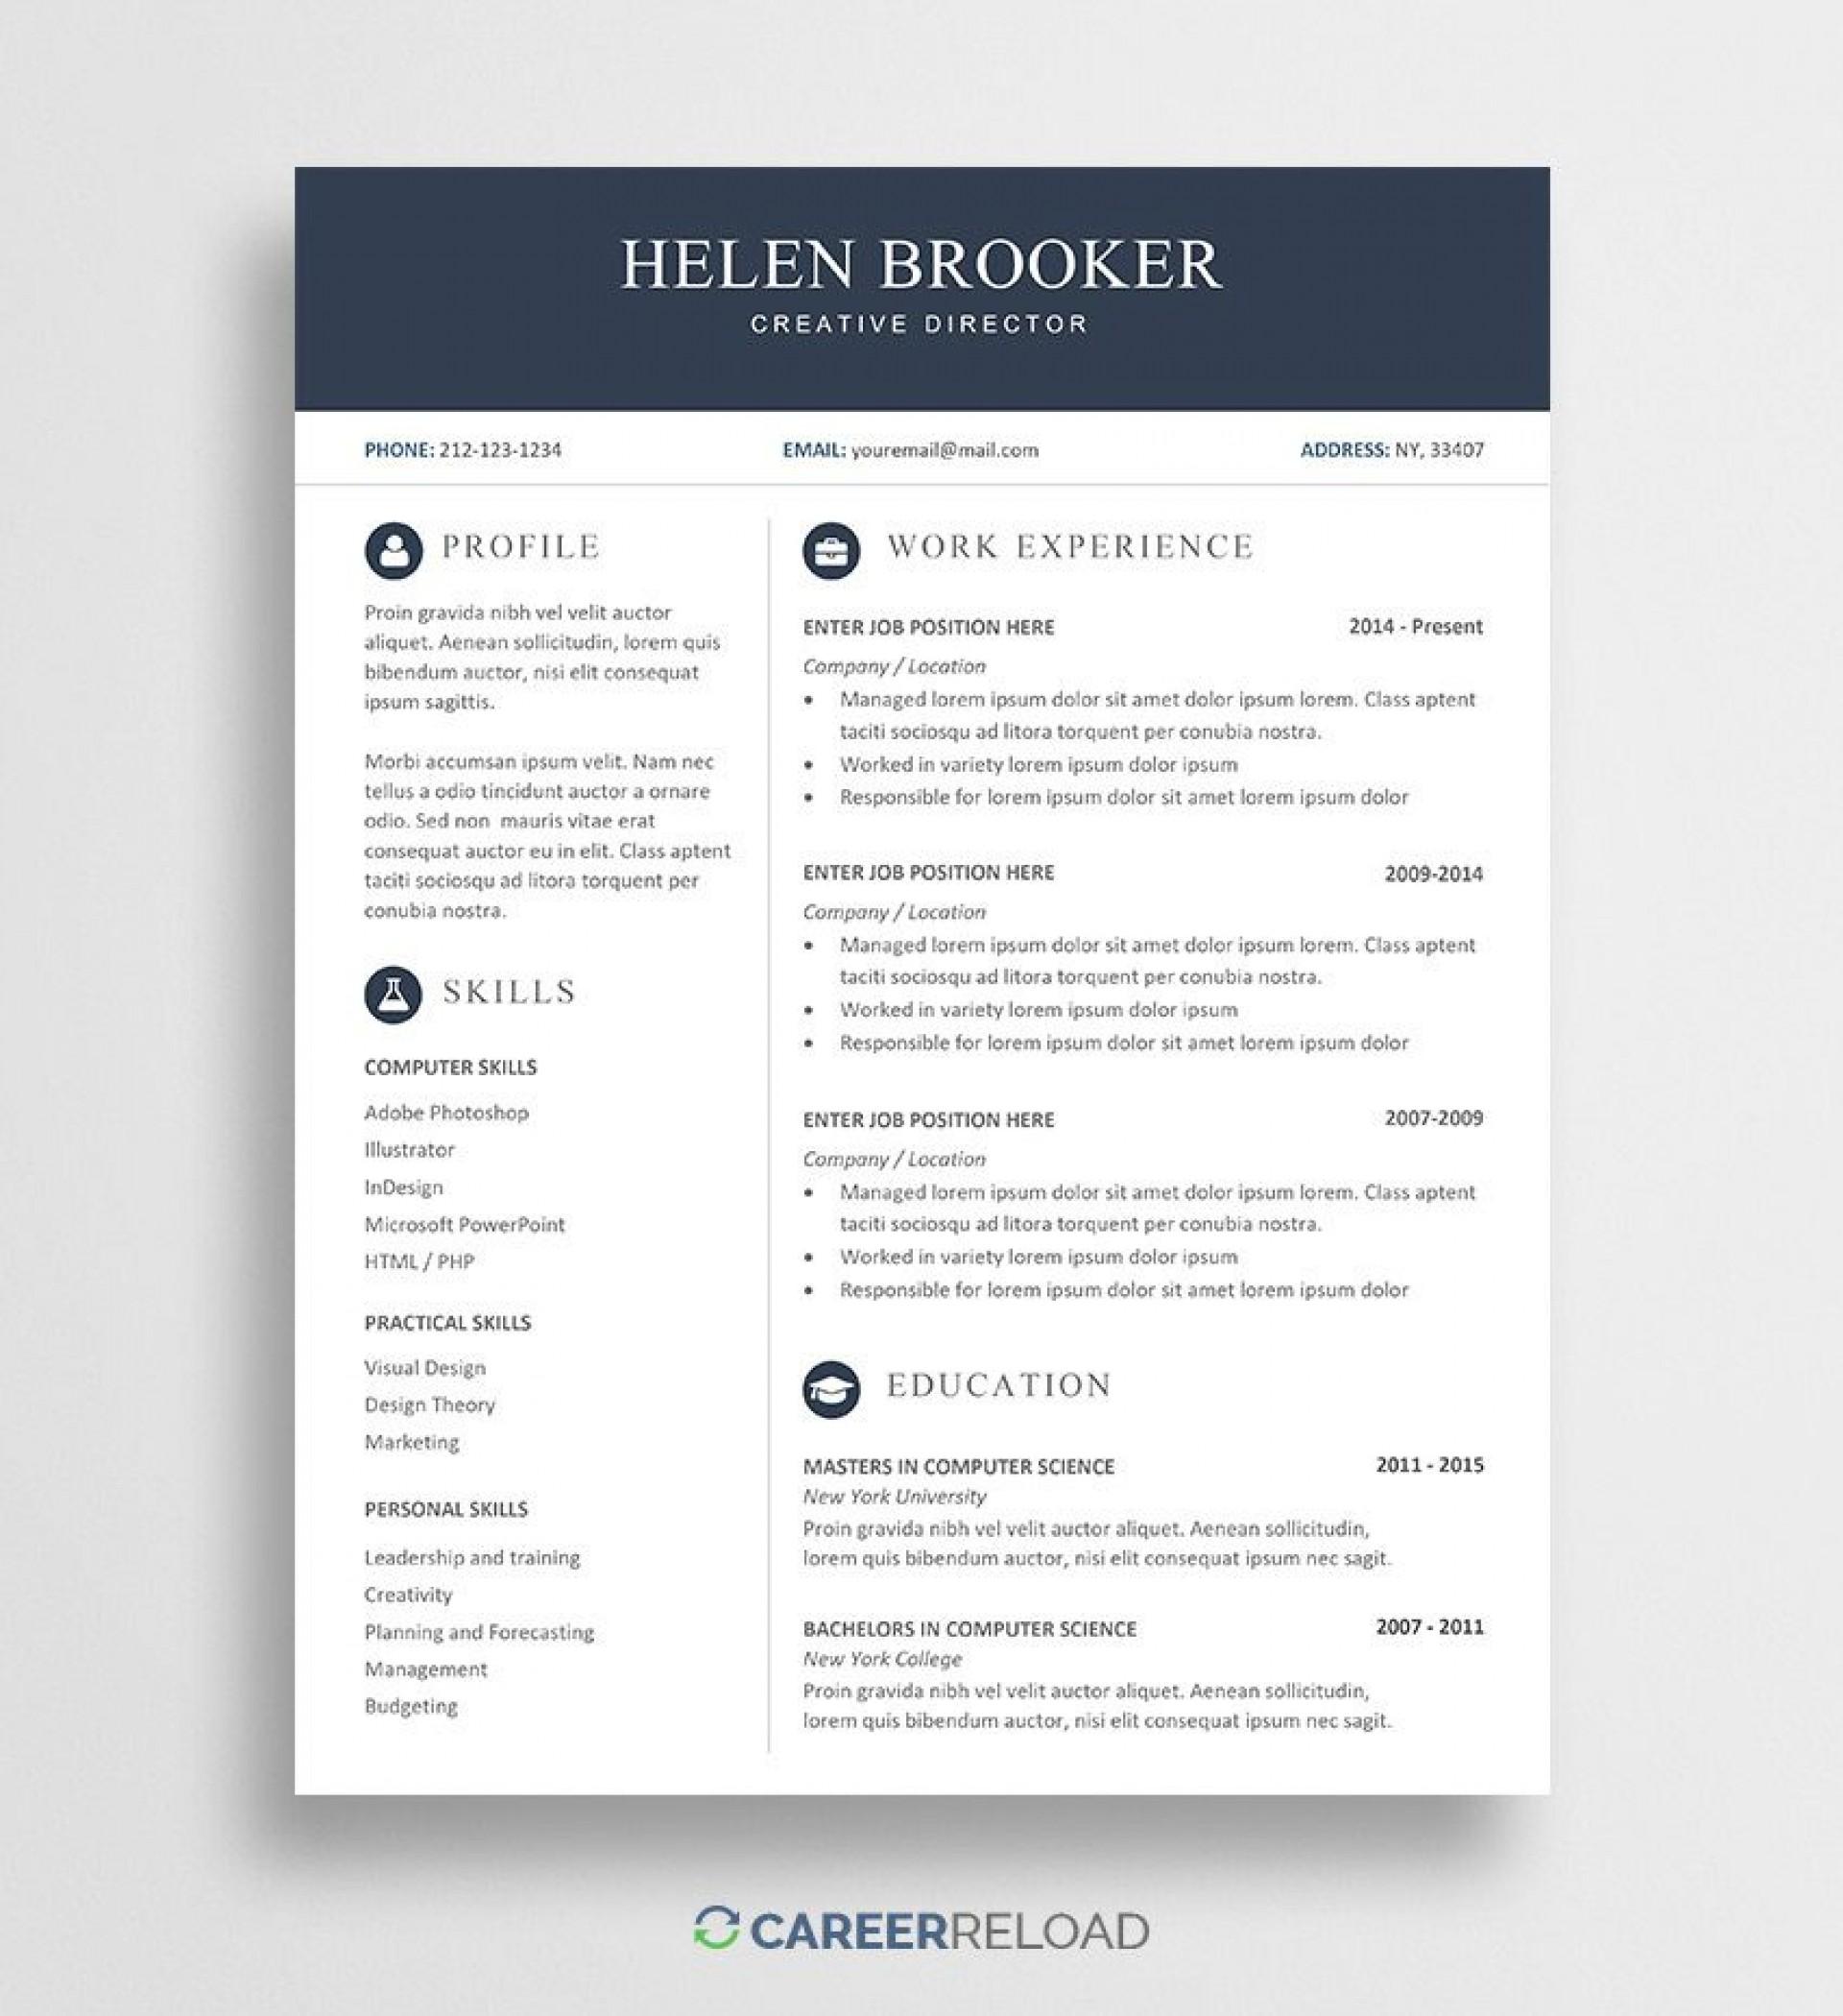 002 Wonderful Microsoft Word Resume Template Sample  Reddit 2019 2010 Free Download1920